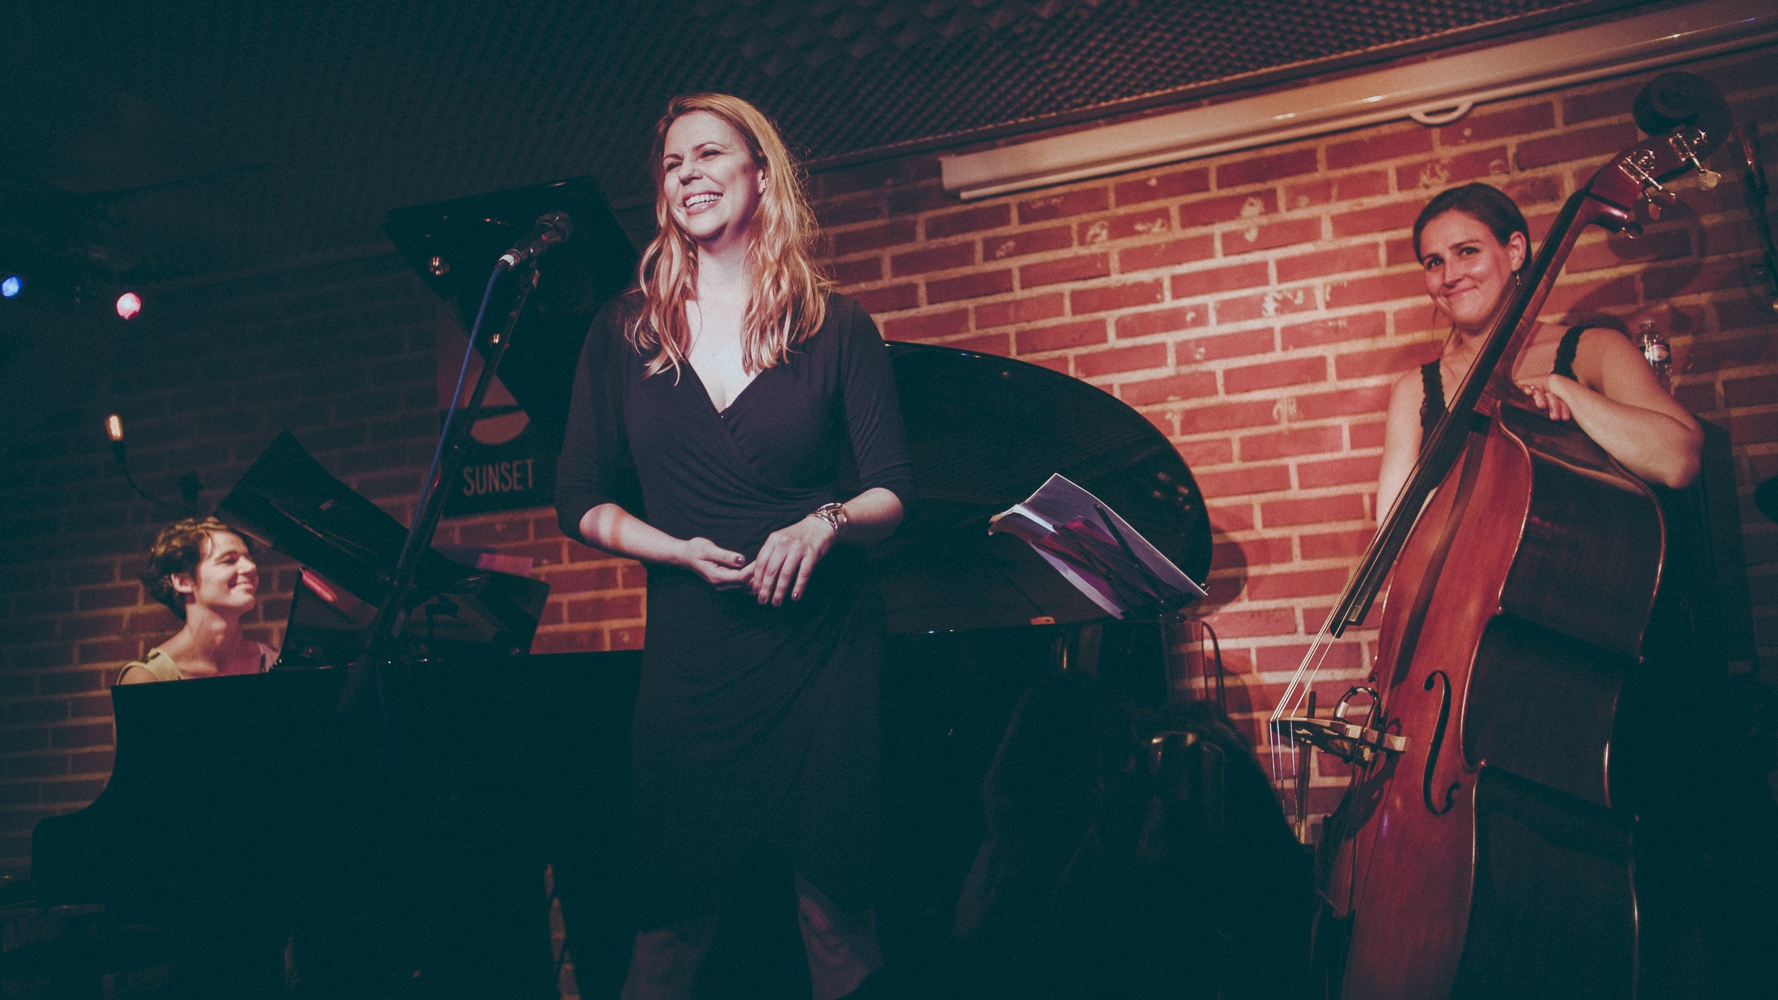 Kurt Weill: Destination Music, Berlin / Paris / New York , The Sunset Sunside Jazz Club, Paris, France. Jennifer Lindshield, soprano, Elise Kermanac'h, piano, Sarah Favinger, bass. Photo credit: Hana Ofangel